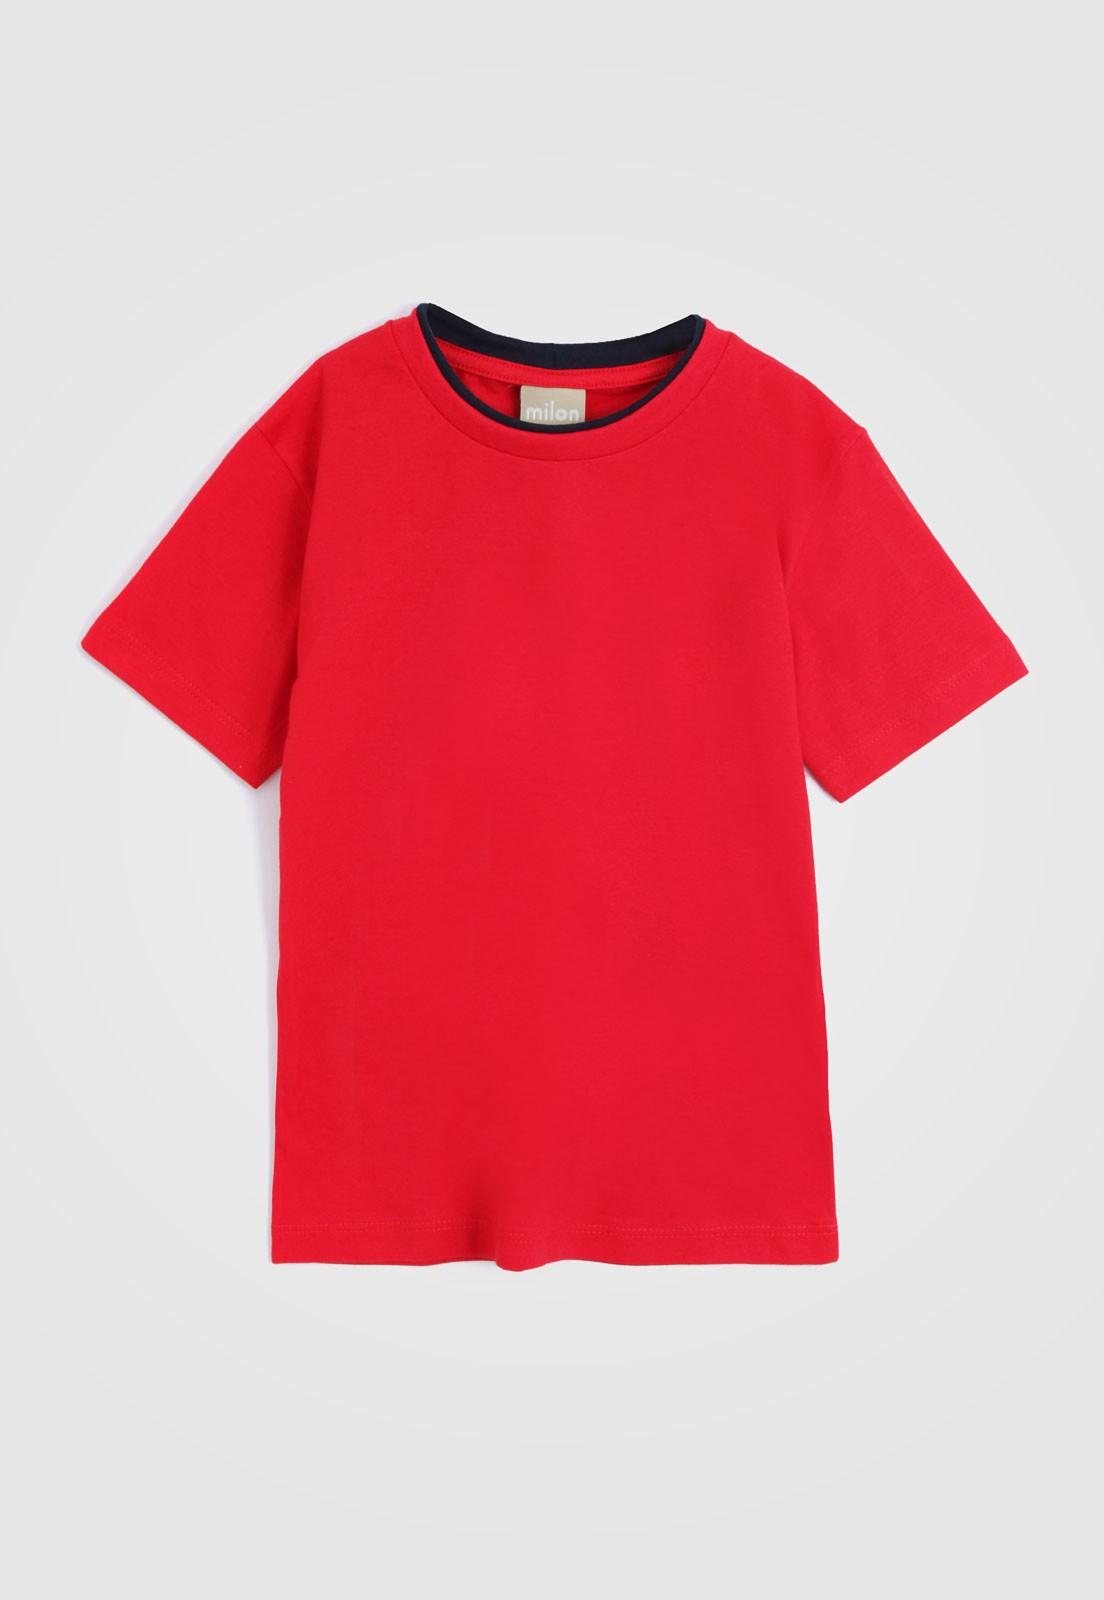 Camiseta infantil masculina - Milon - 11866